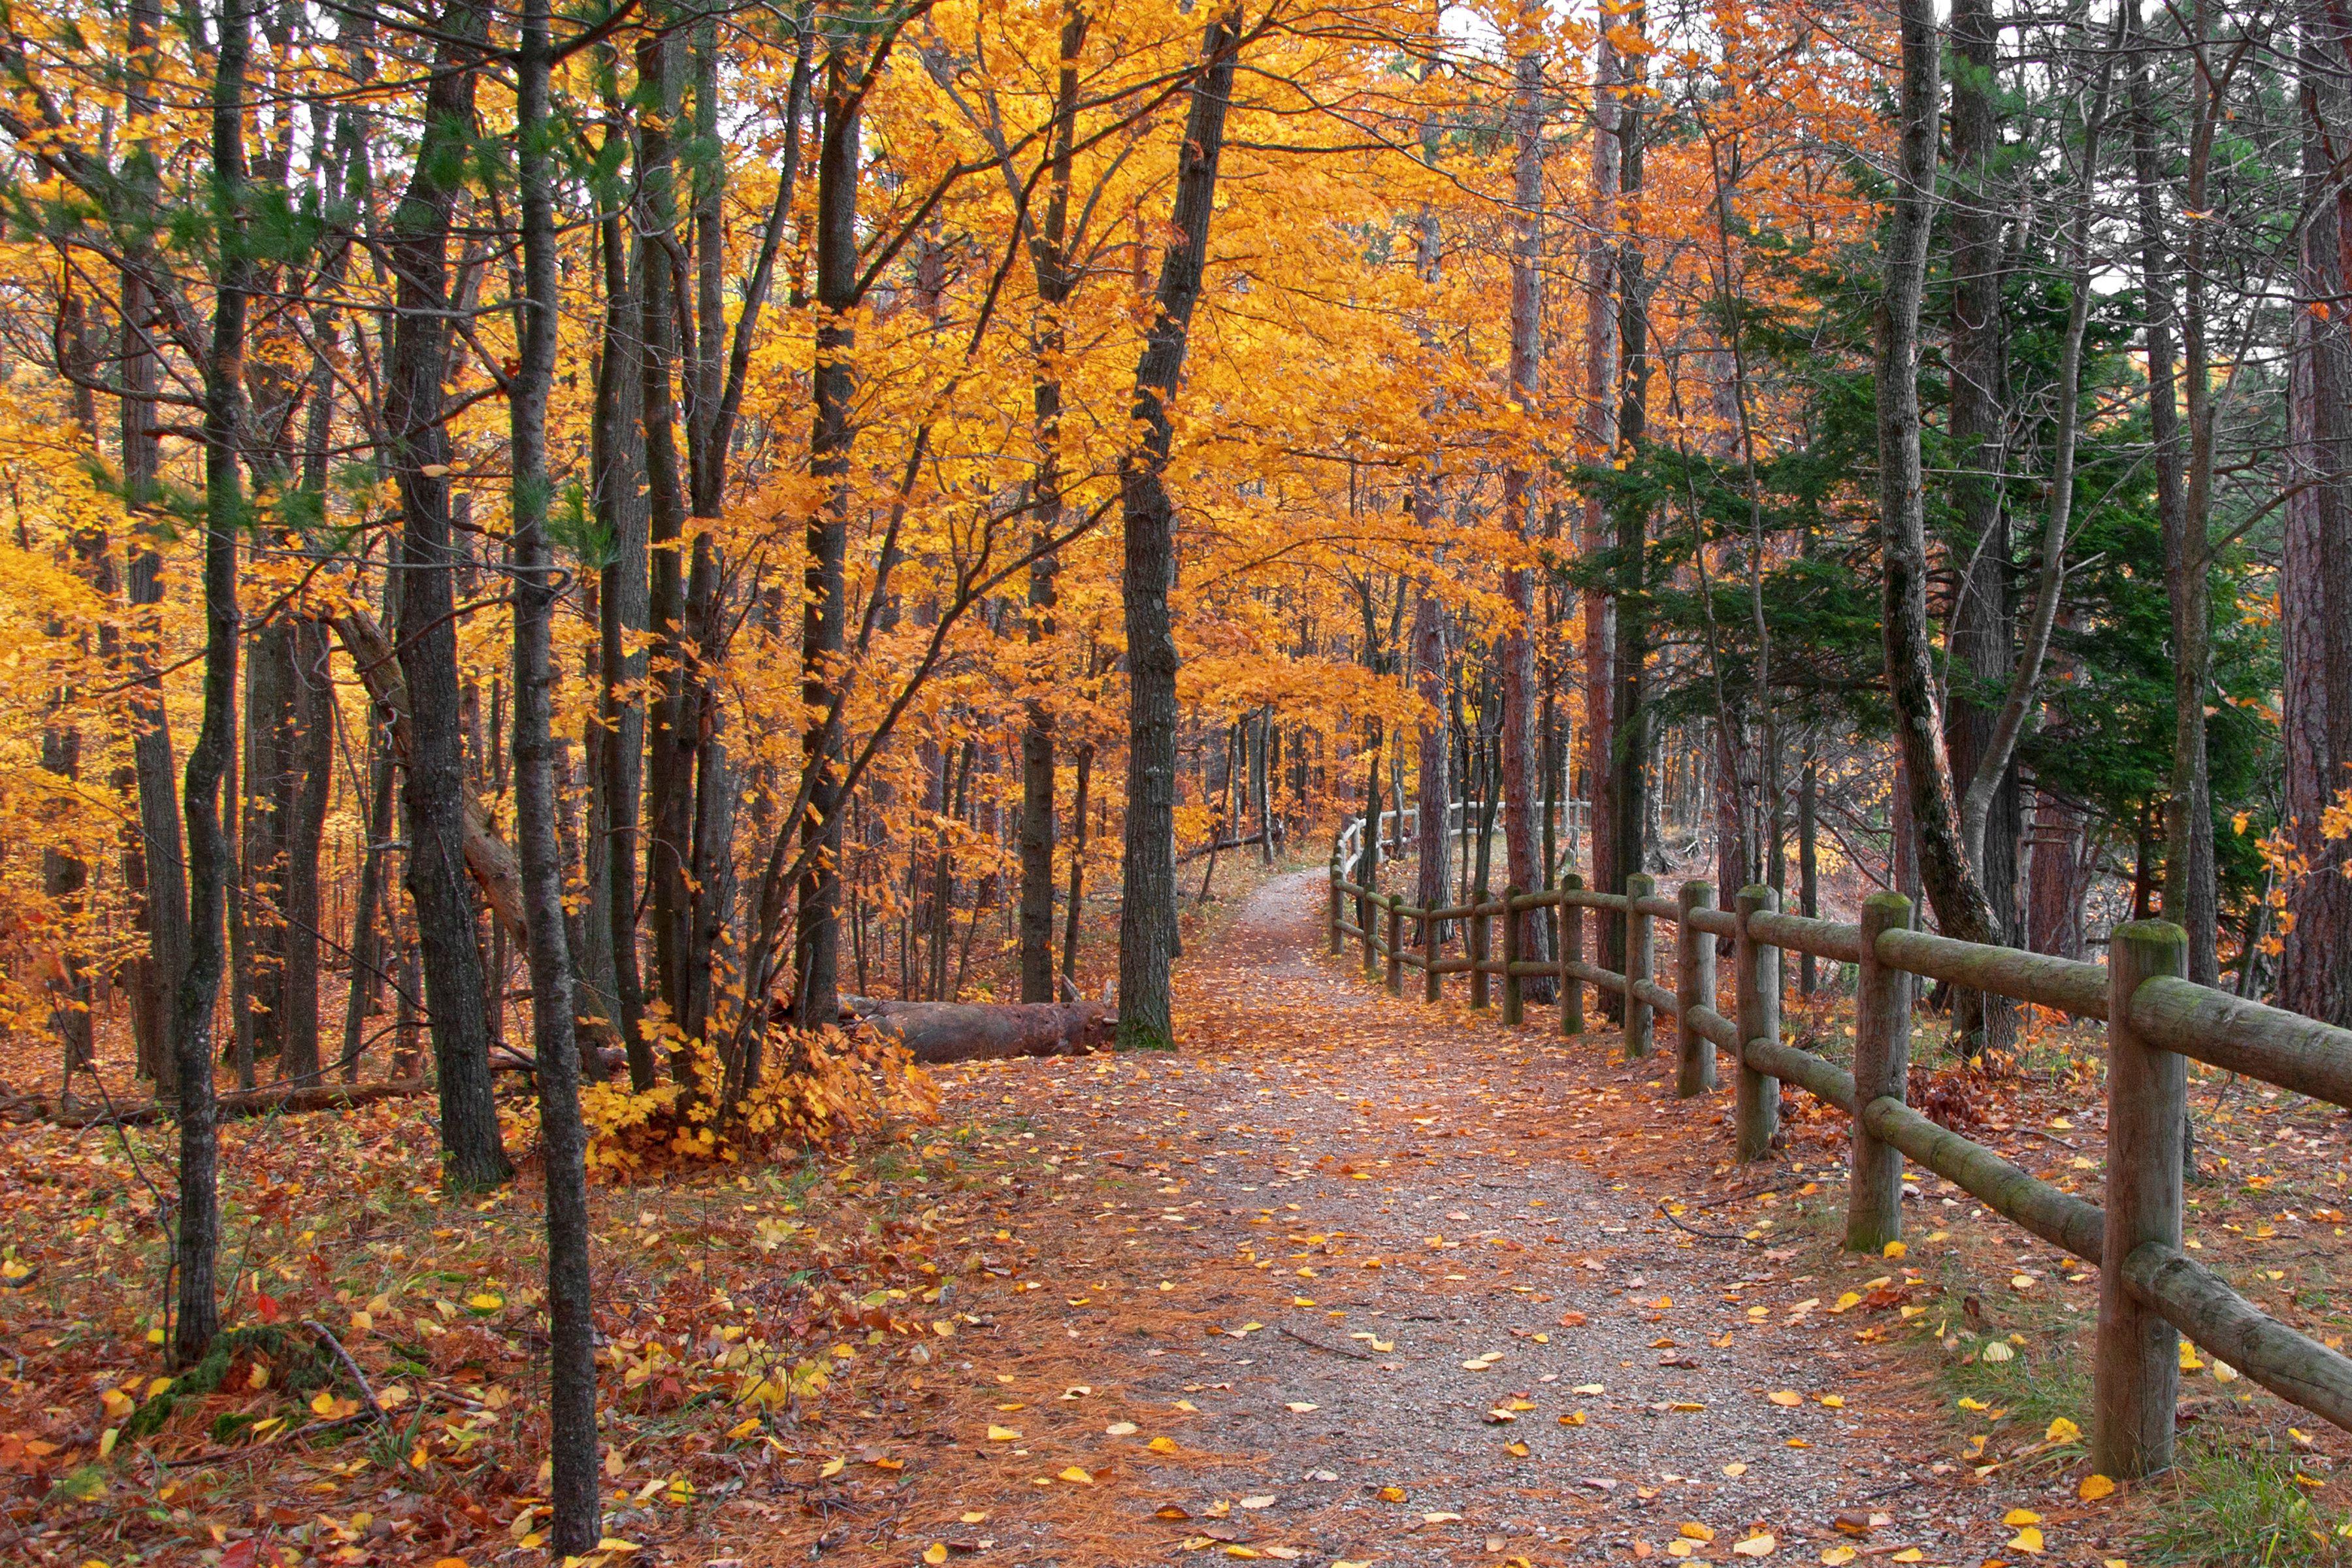 Forest trail in autumn in Traverse City, Michigan